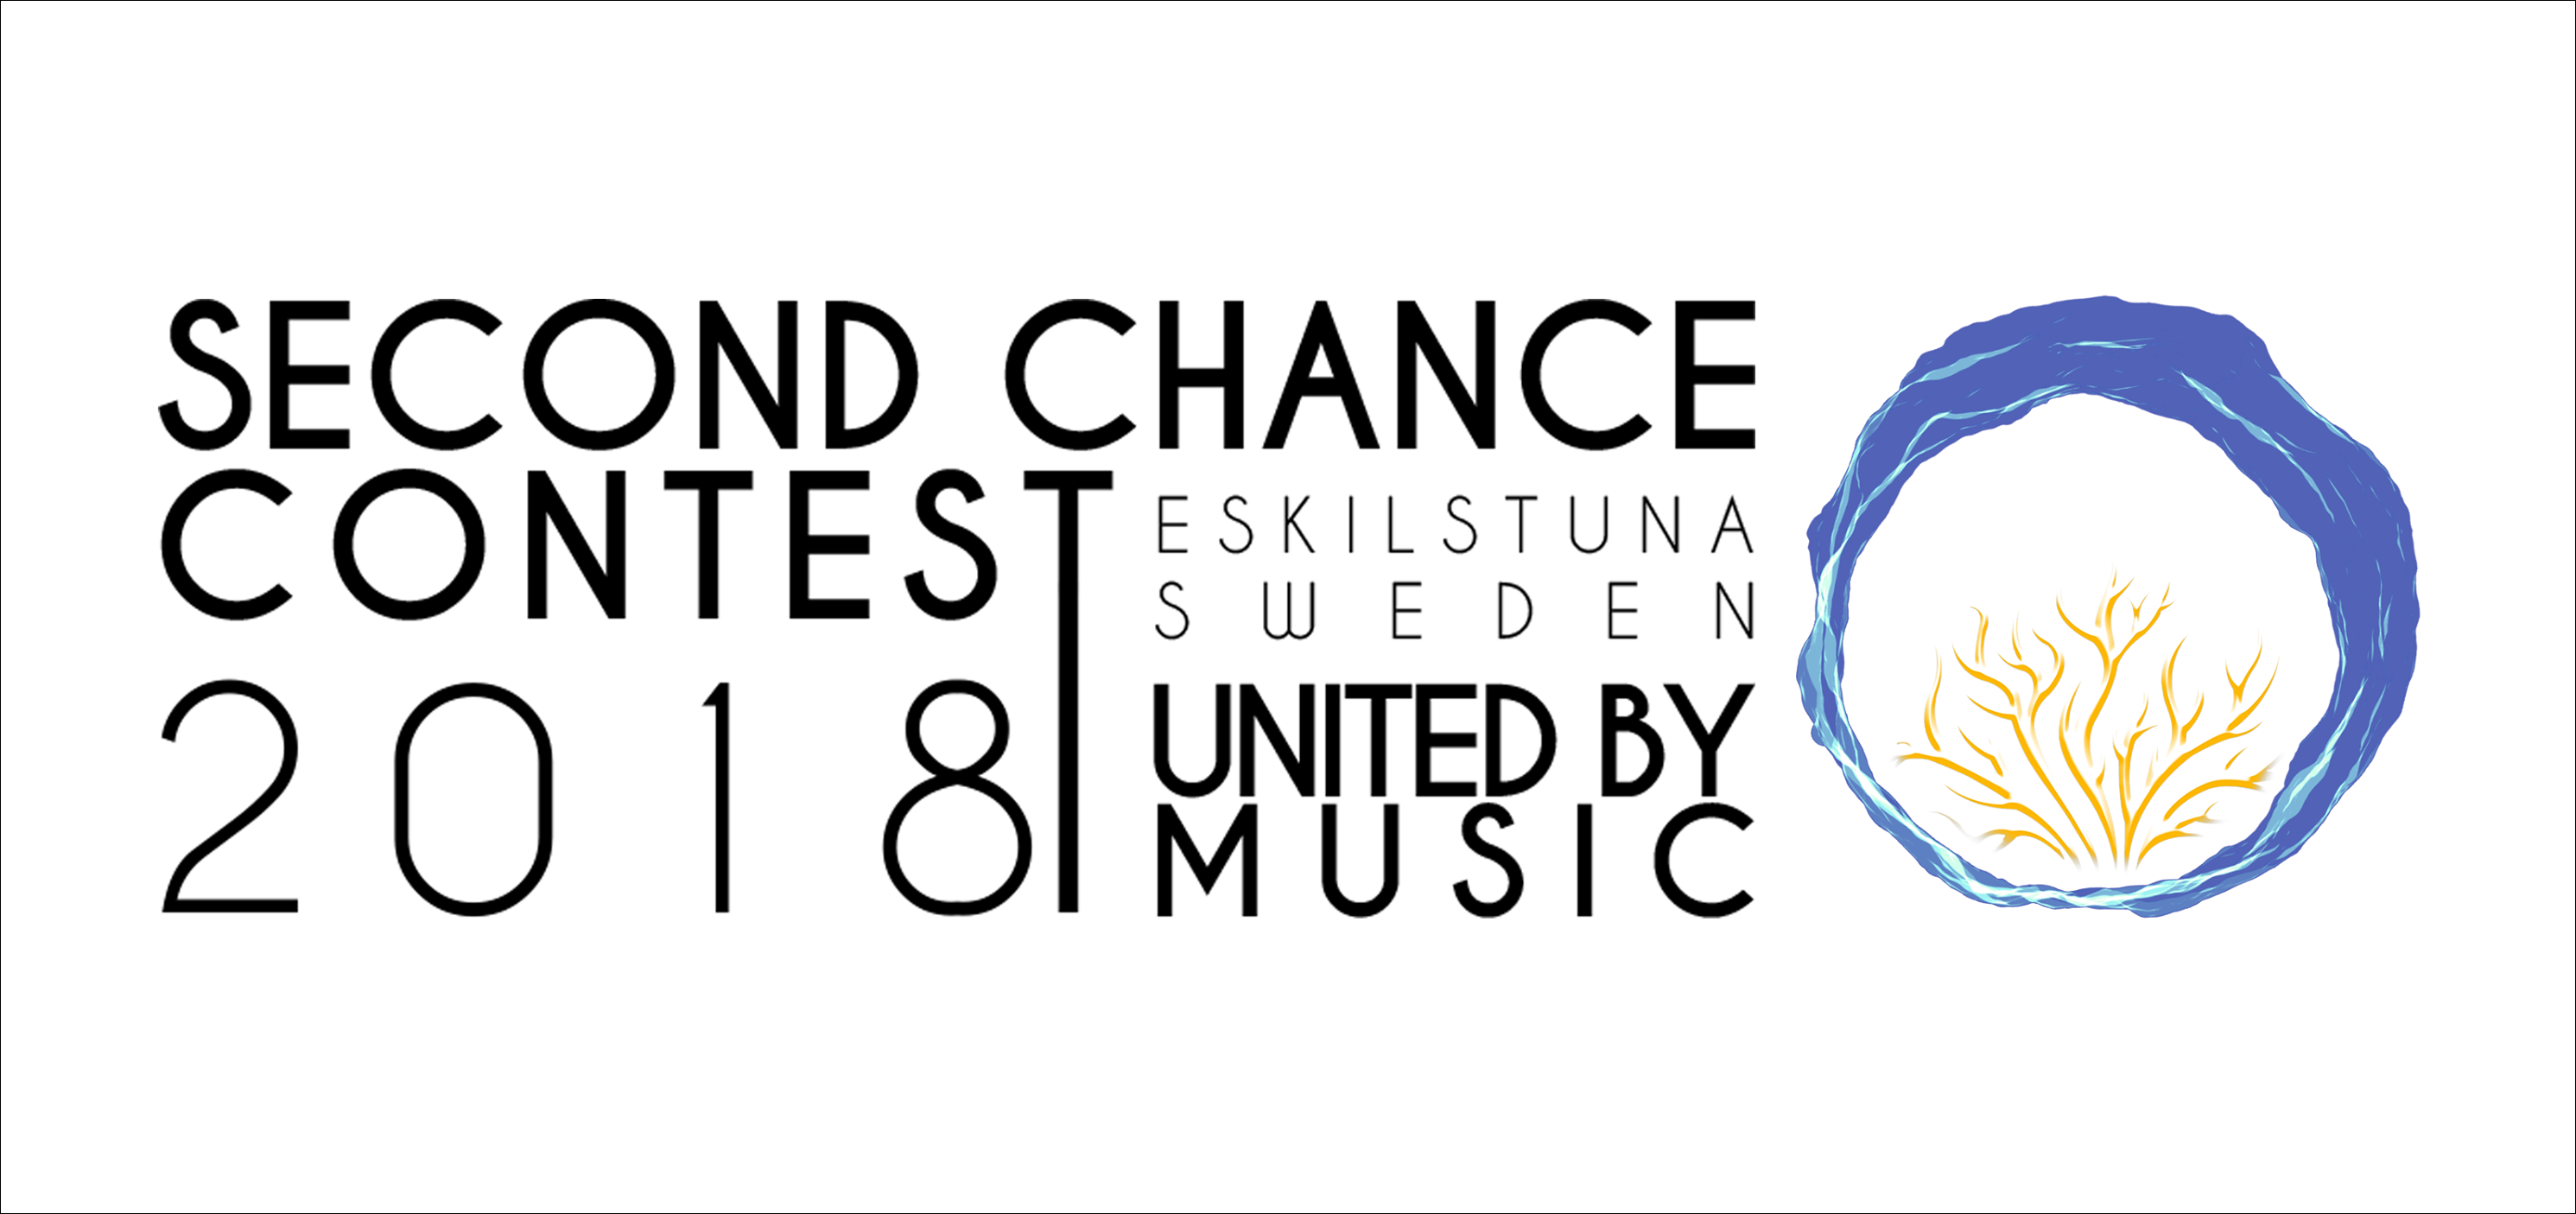 OGAE Second Chance Contest 2018 : victoire d'Annalisa